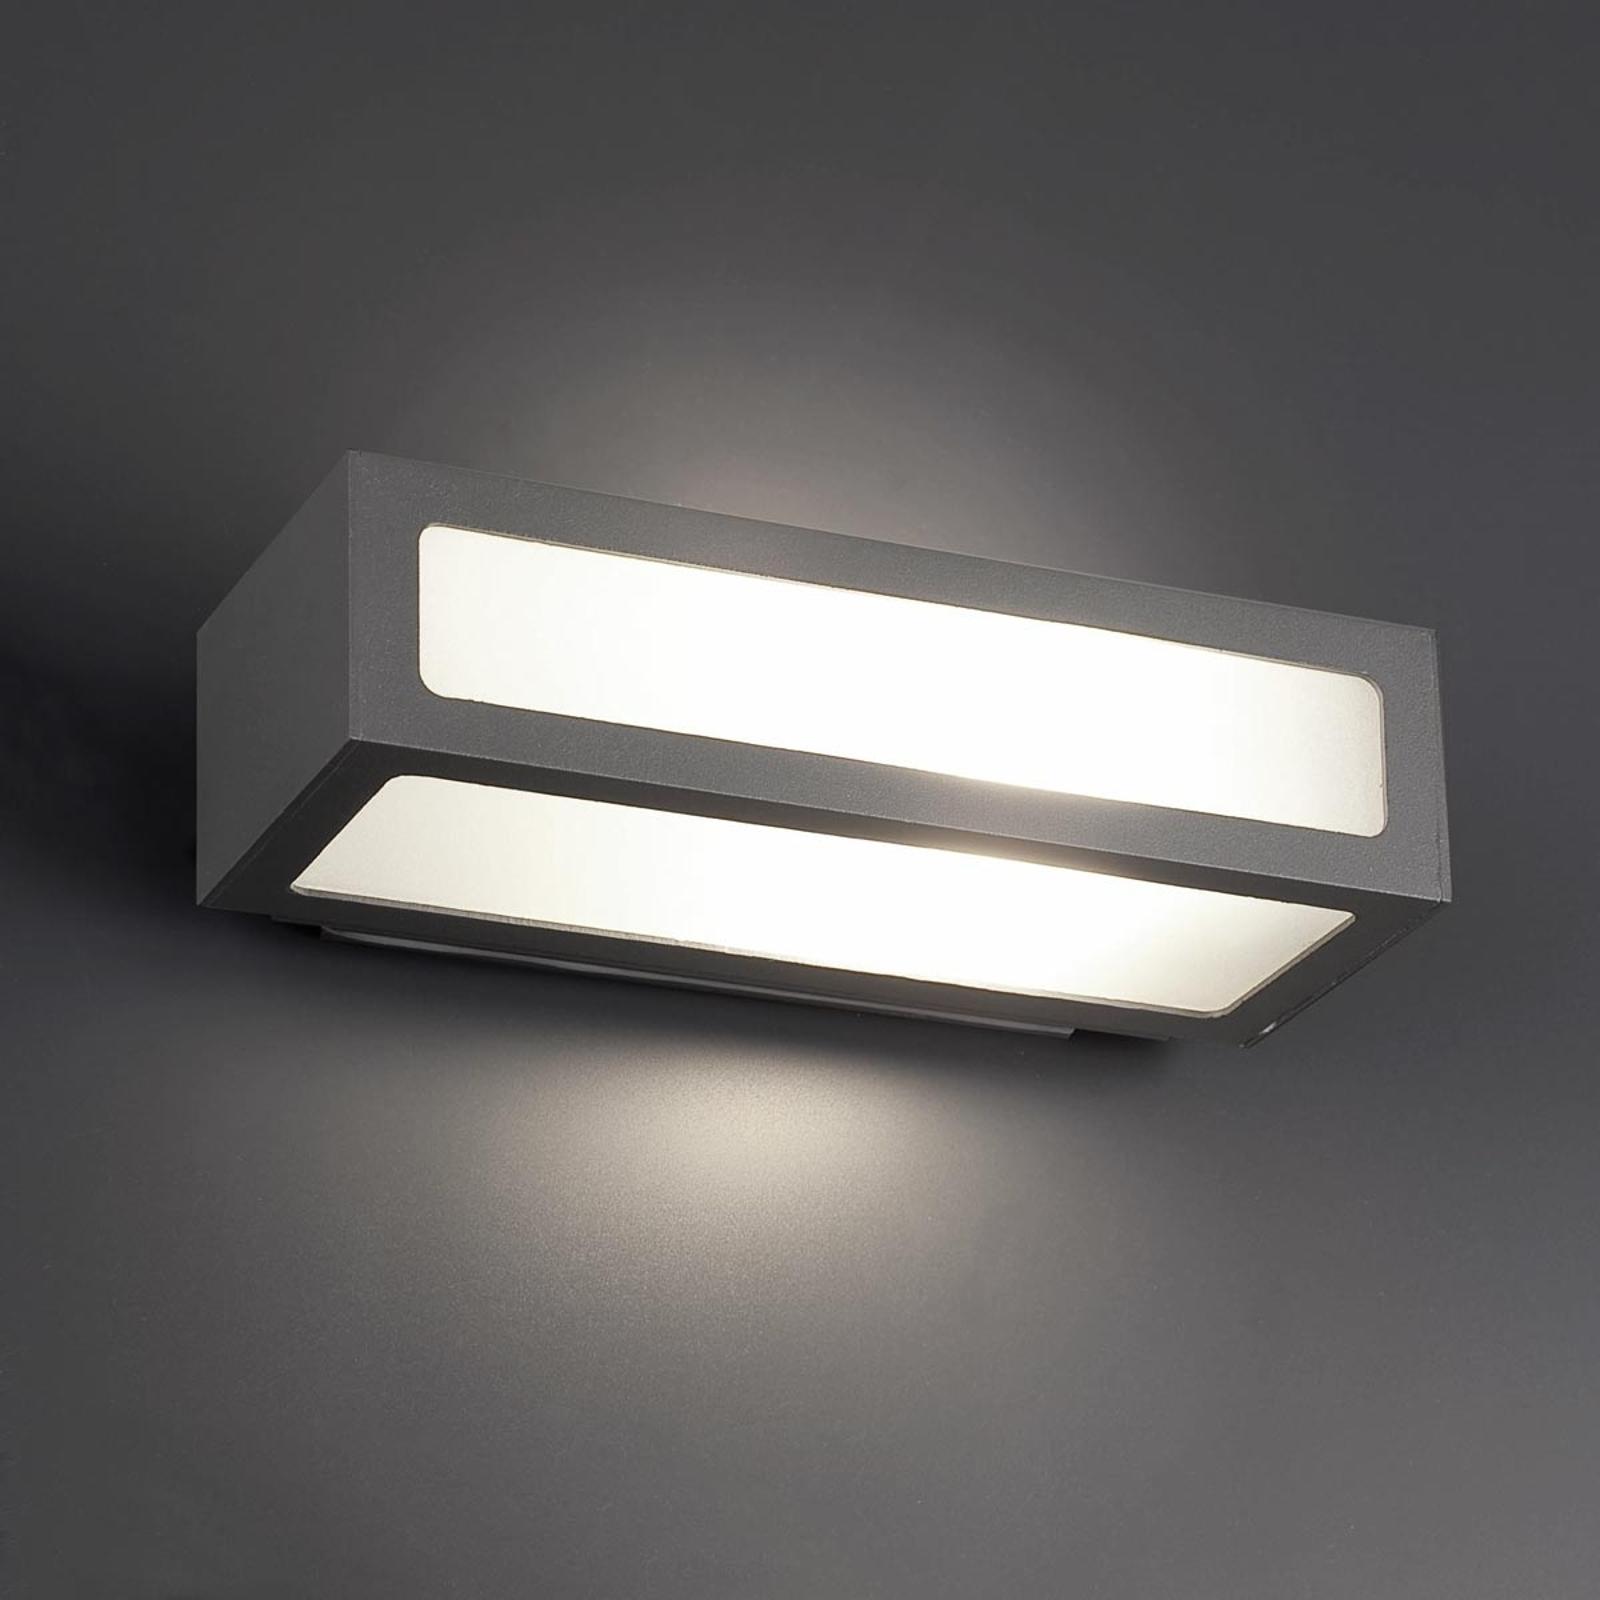 Natron Outdoor Wall Light Lights Co Uk